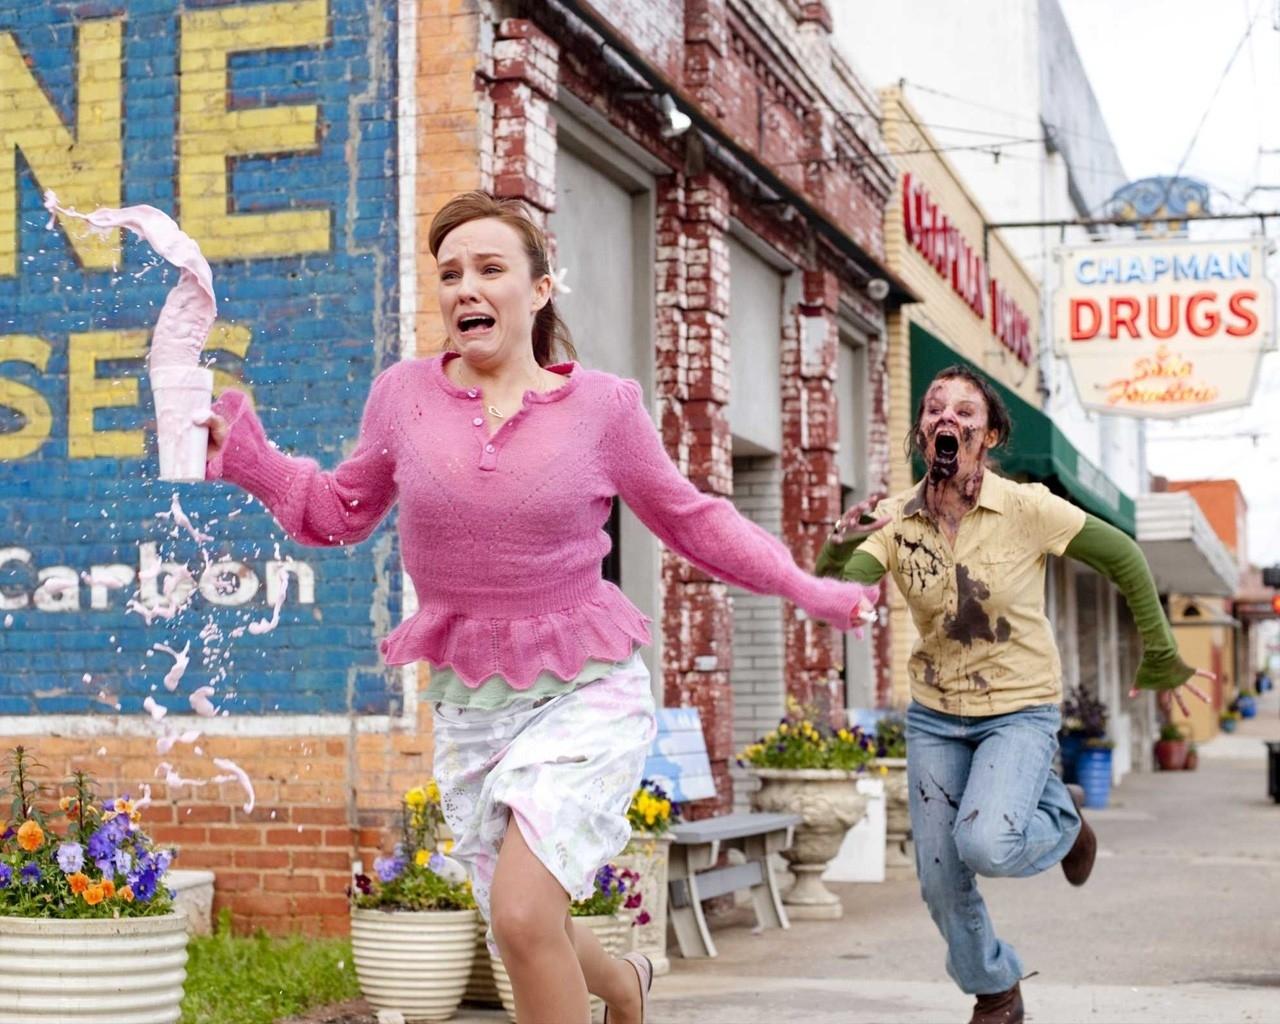 Top 5 Best and Worst Zombie Film Clichés